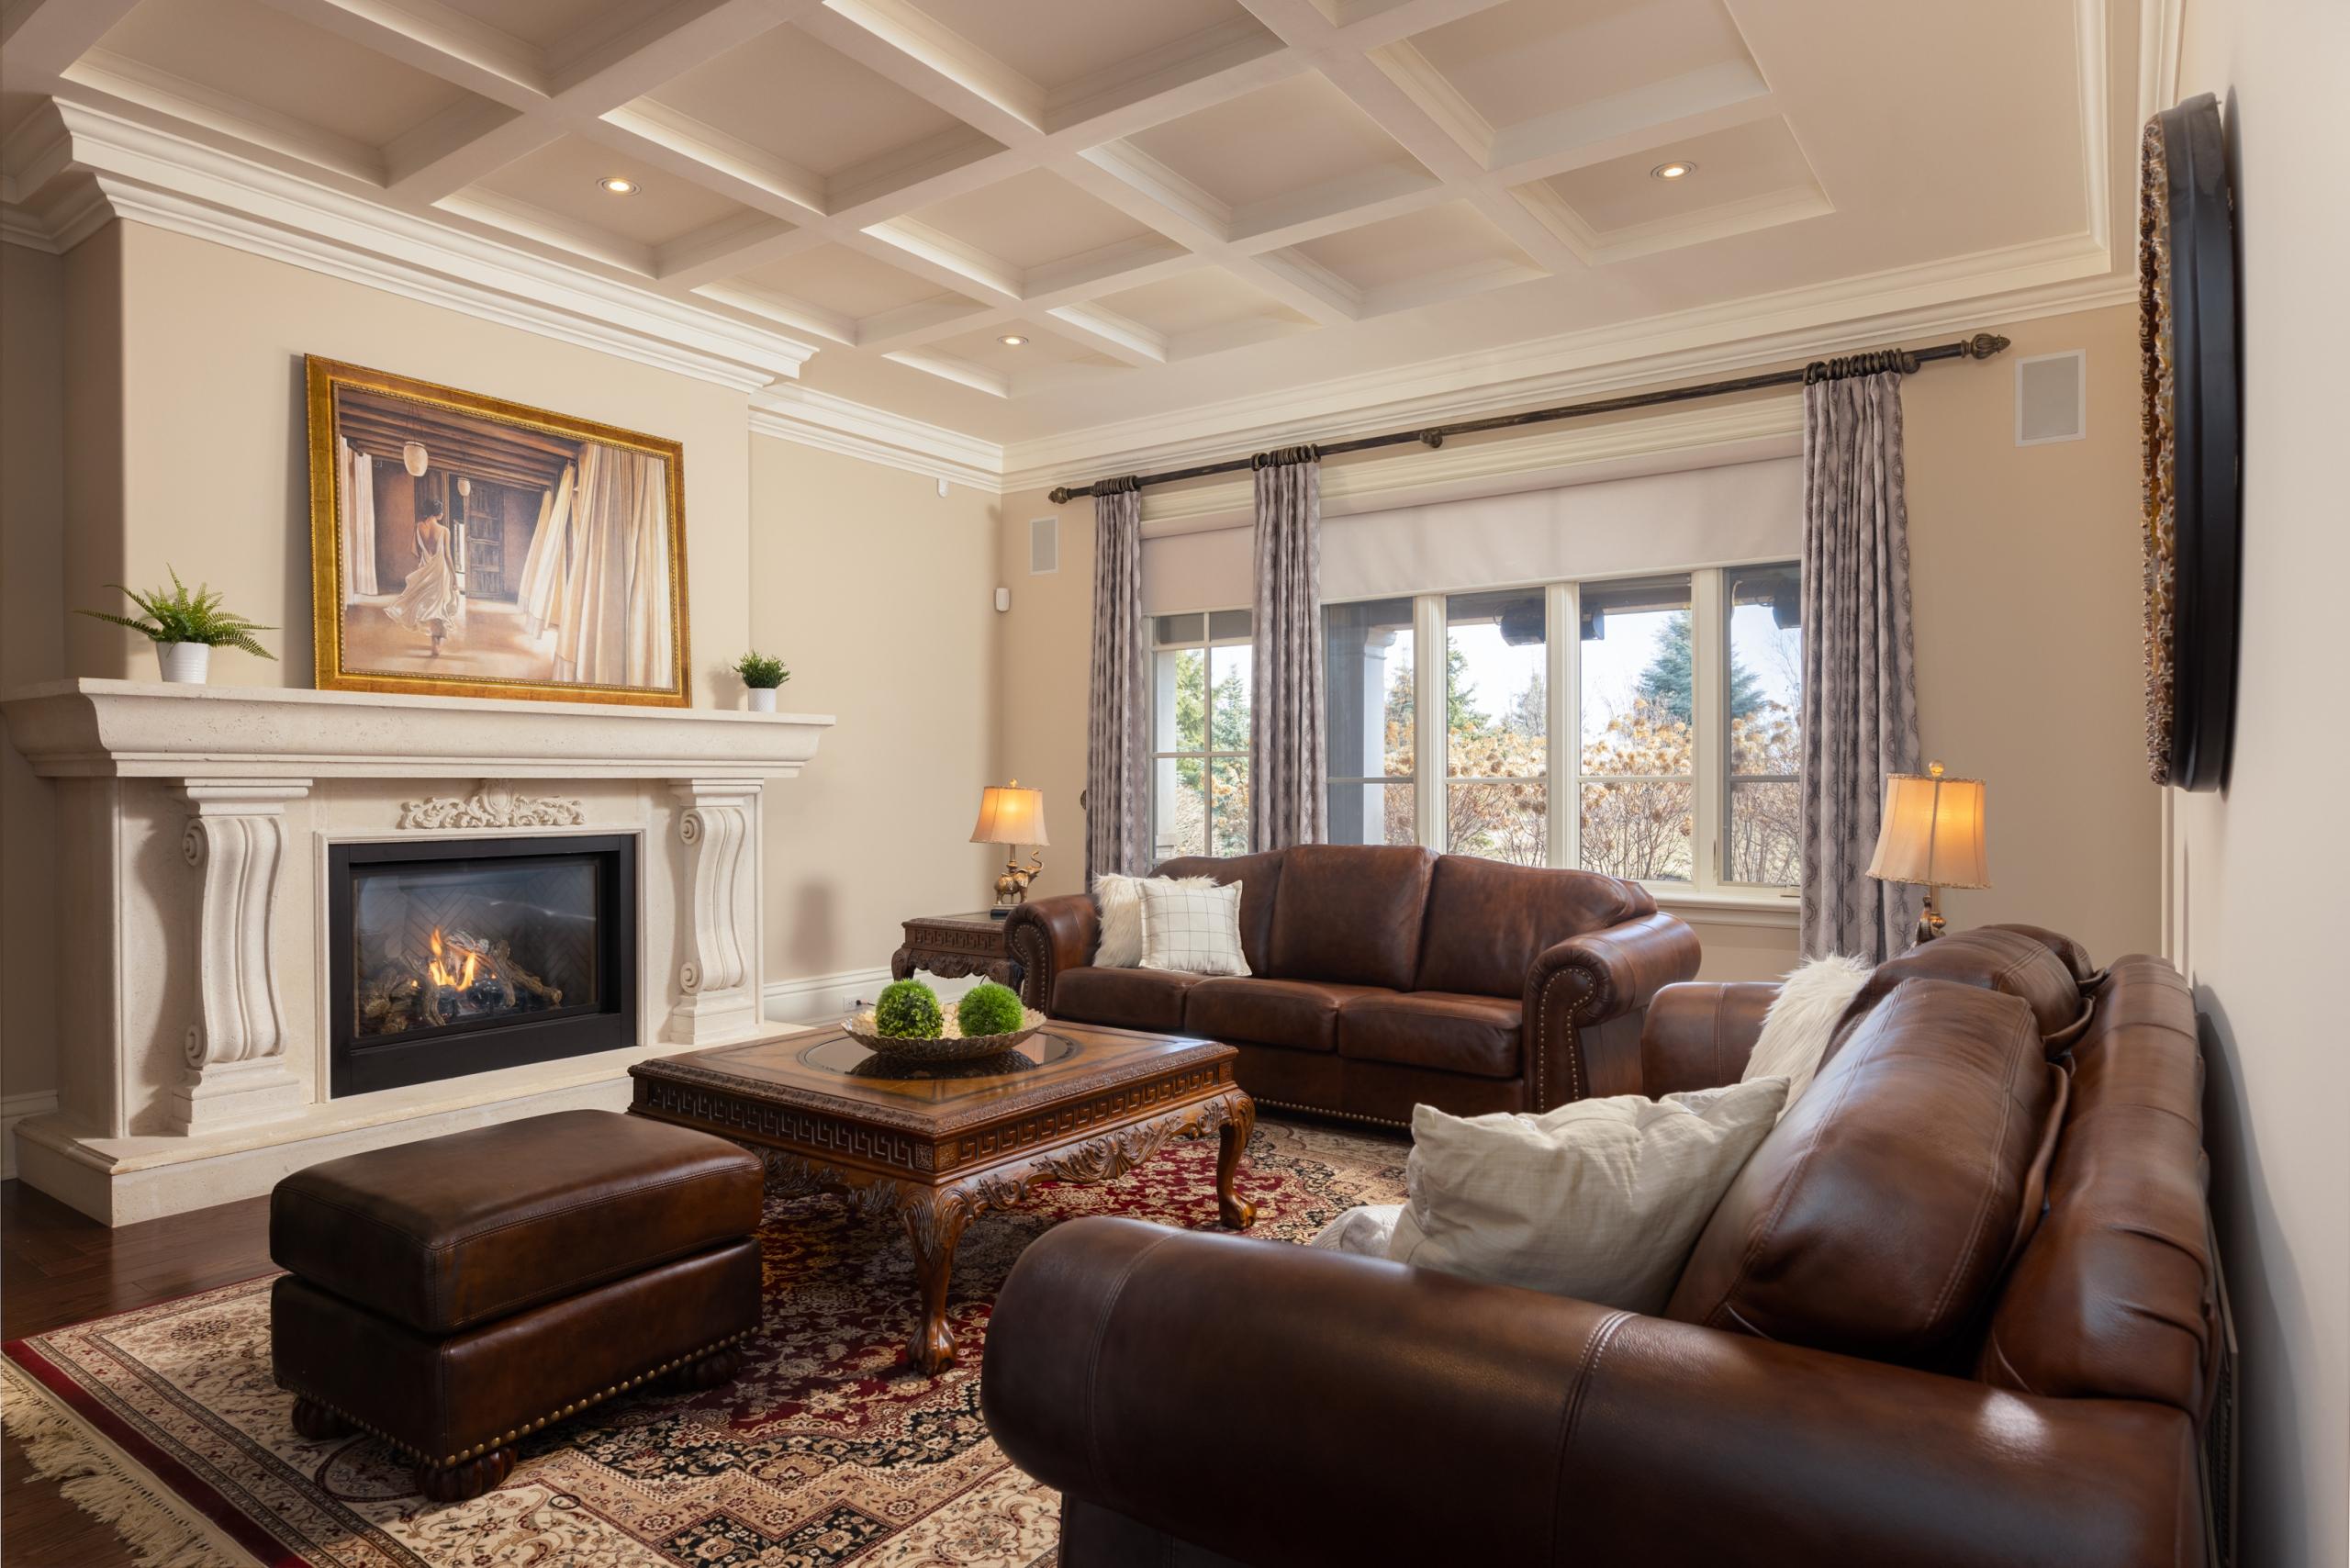 Living room featured at 2594 Bluffs Way, Burlington at Alex Irish & Associates